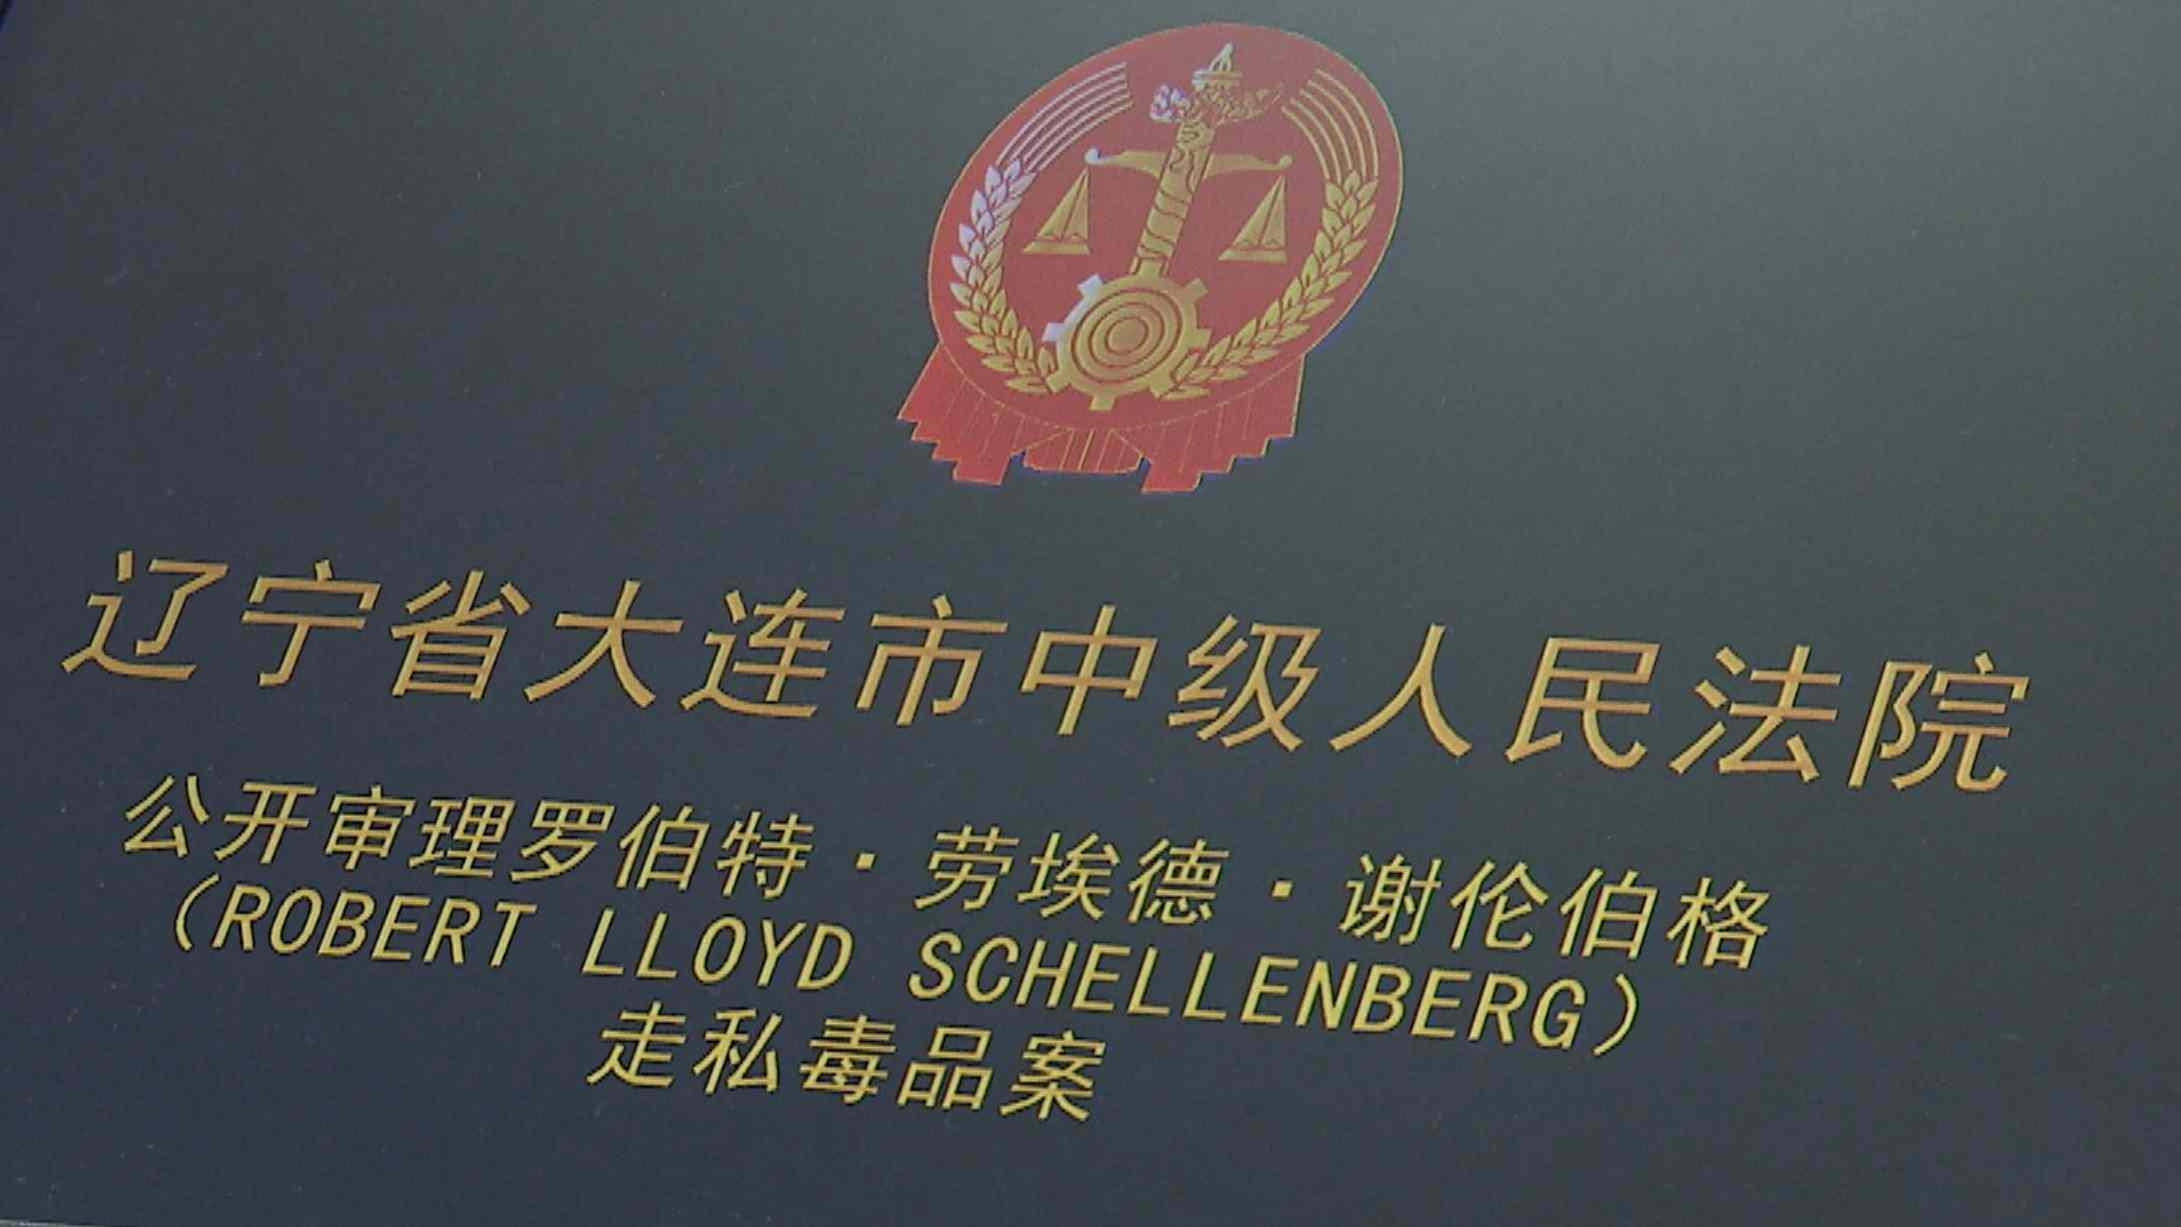 China hits back at Canadian accusation over drug smuggler's death sentence